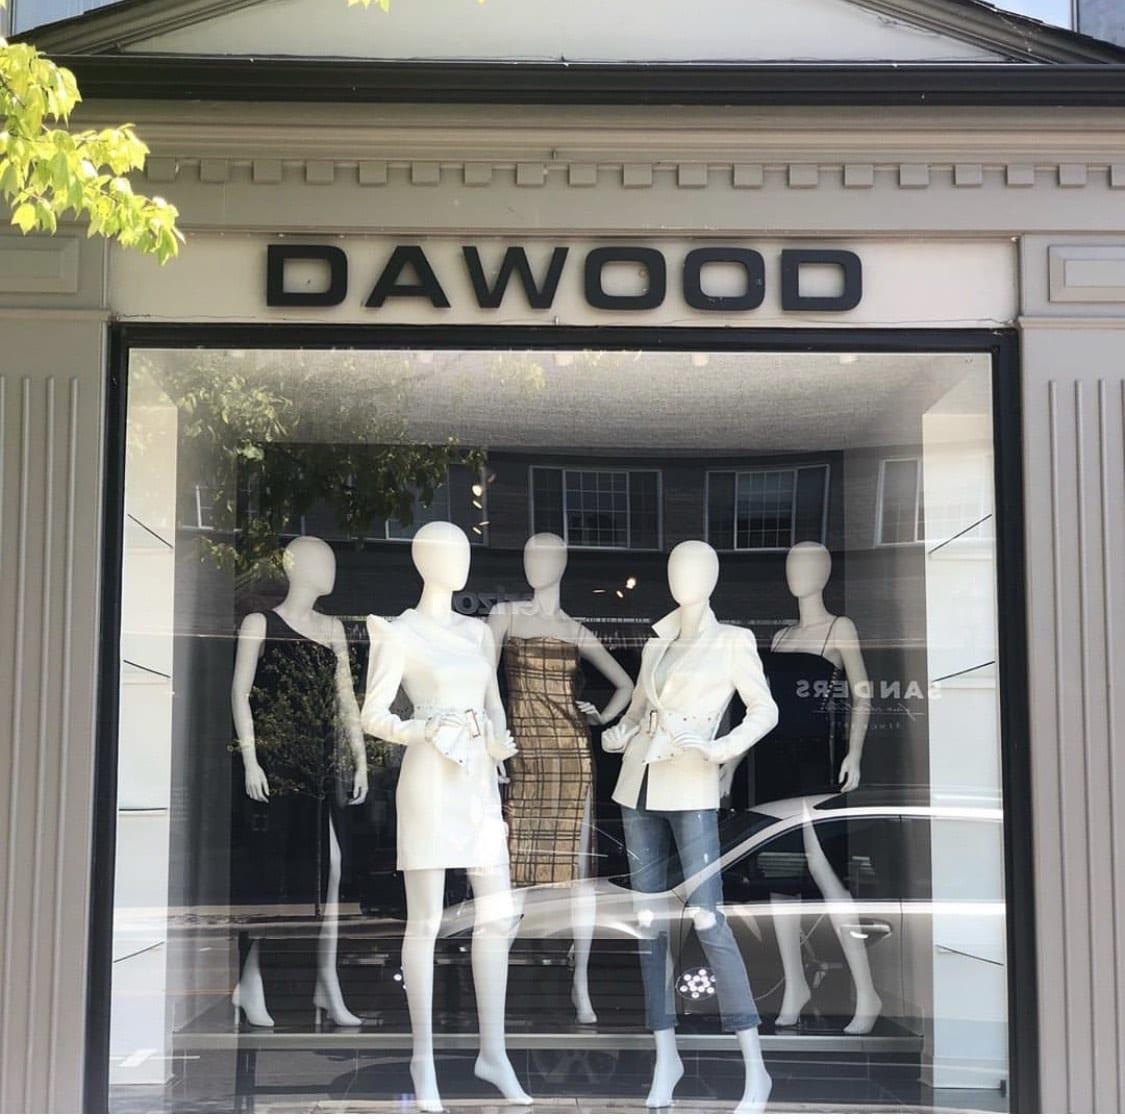 Dawood Storefront